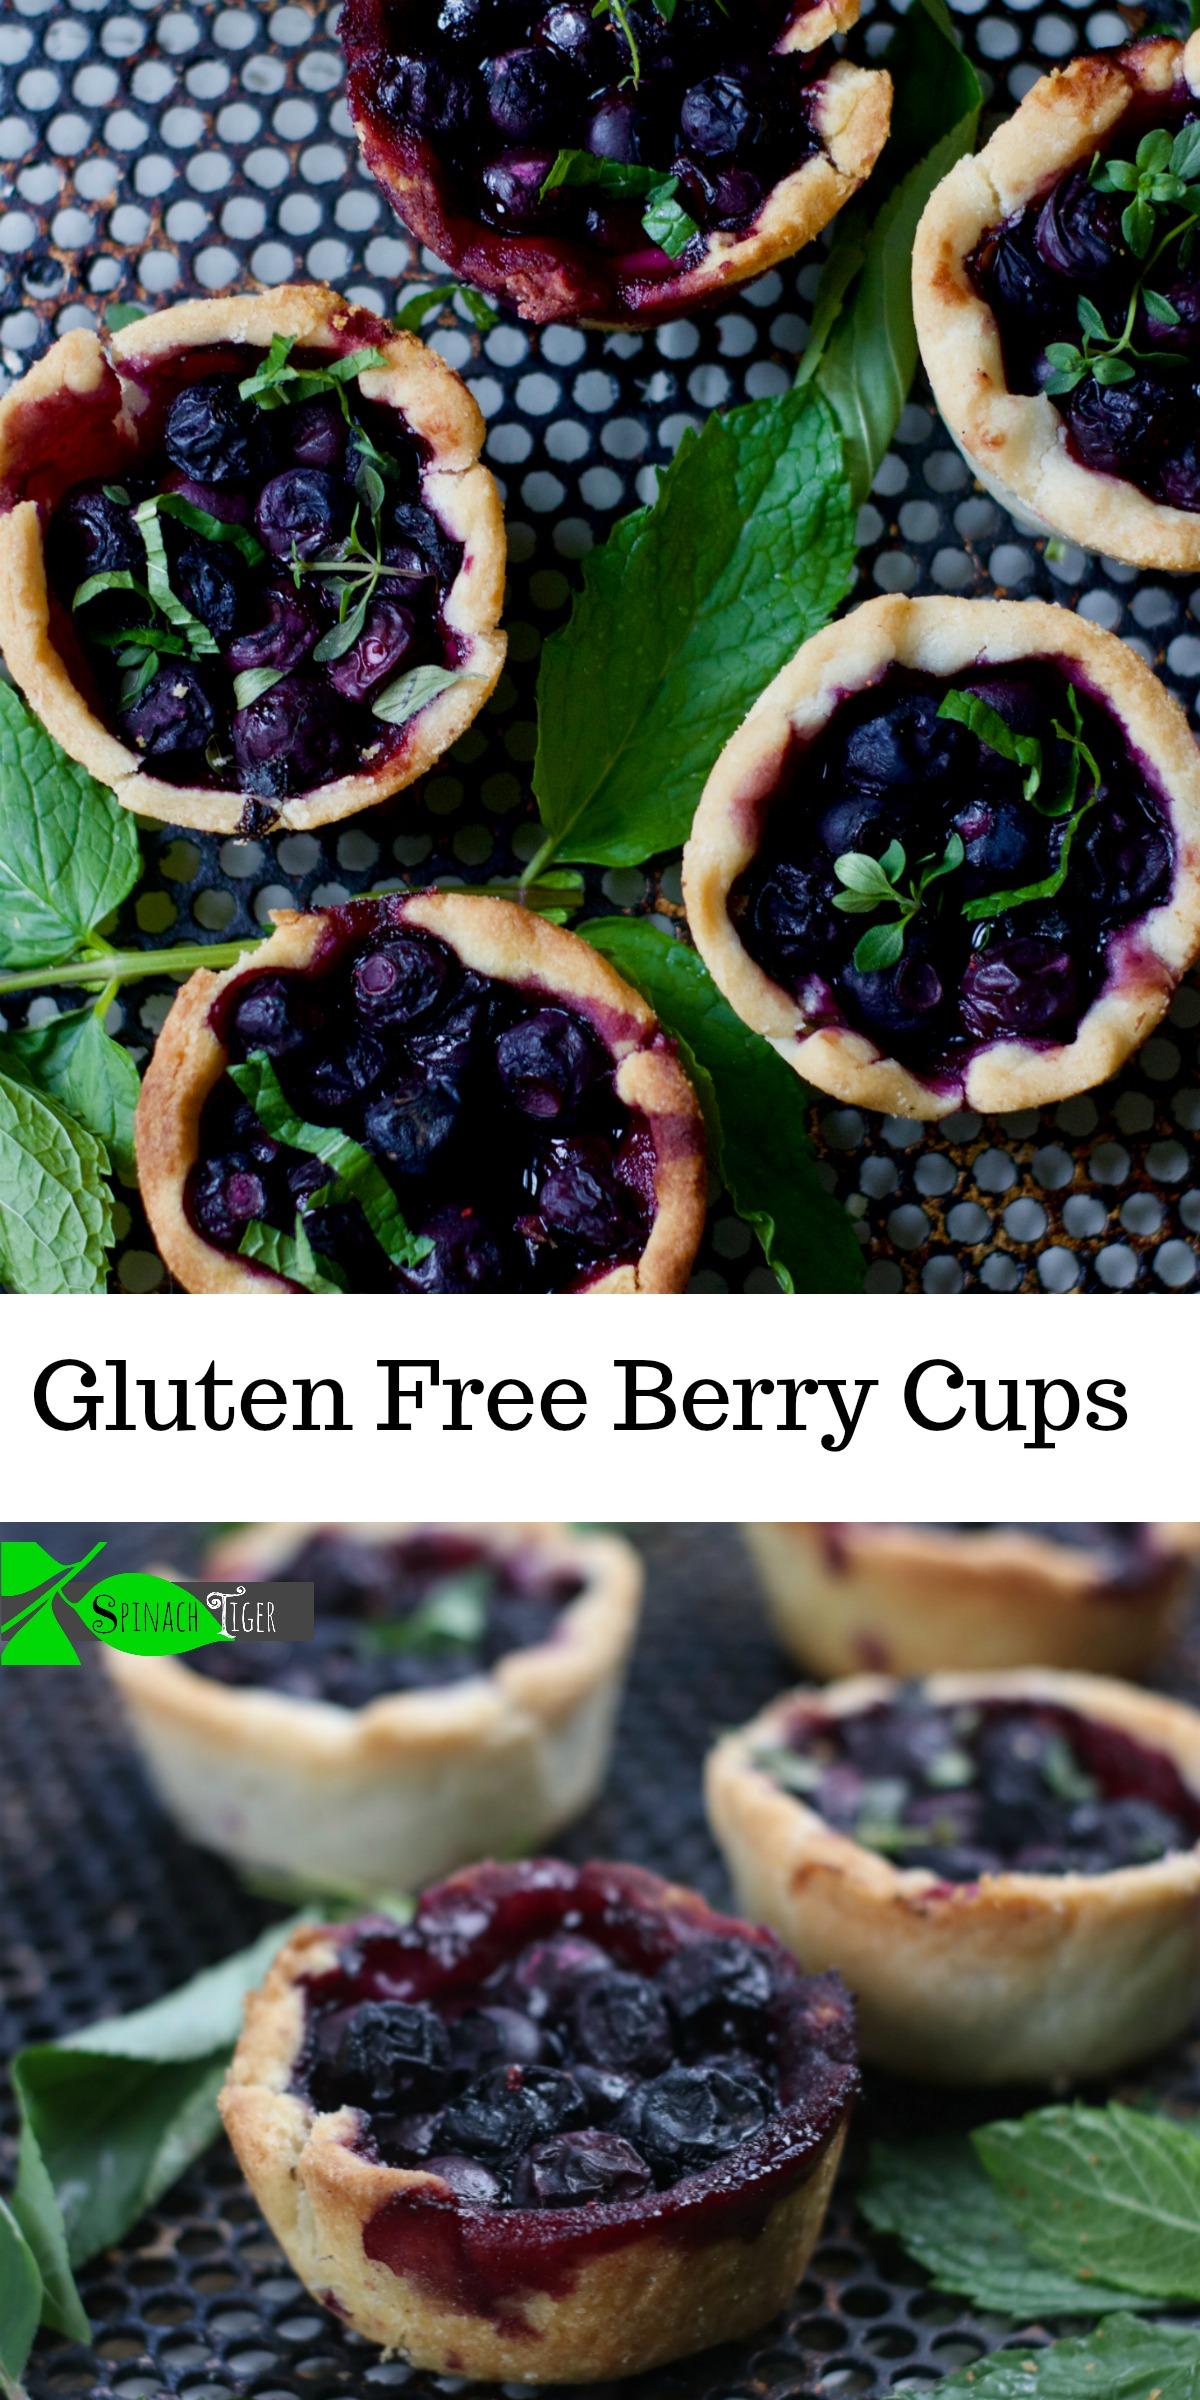 Most Popular Instagram Posts: Gluten Free Berry Cups